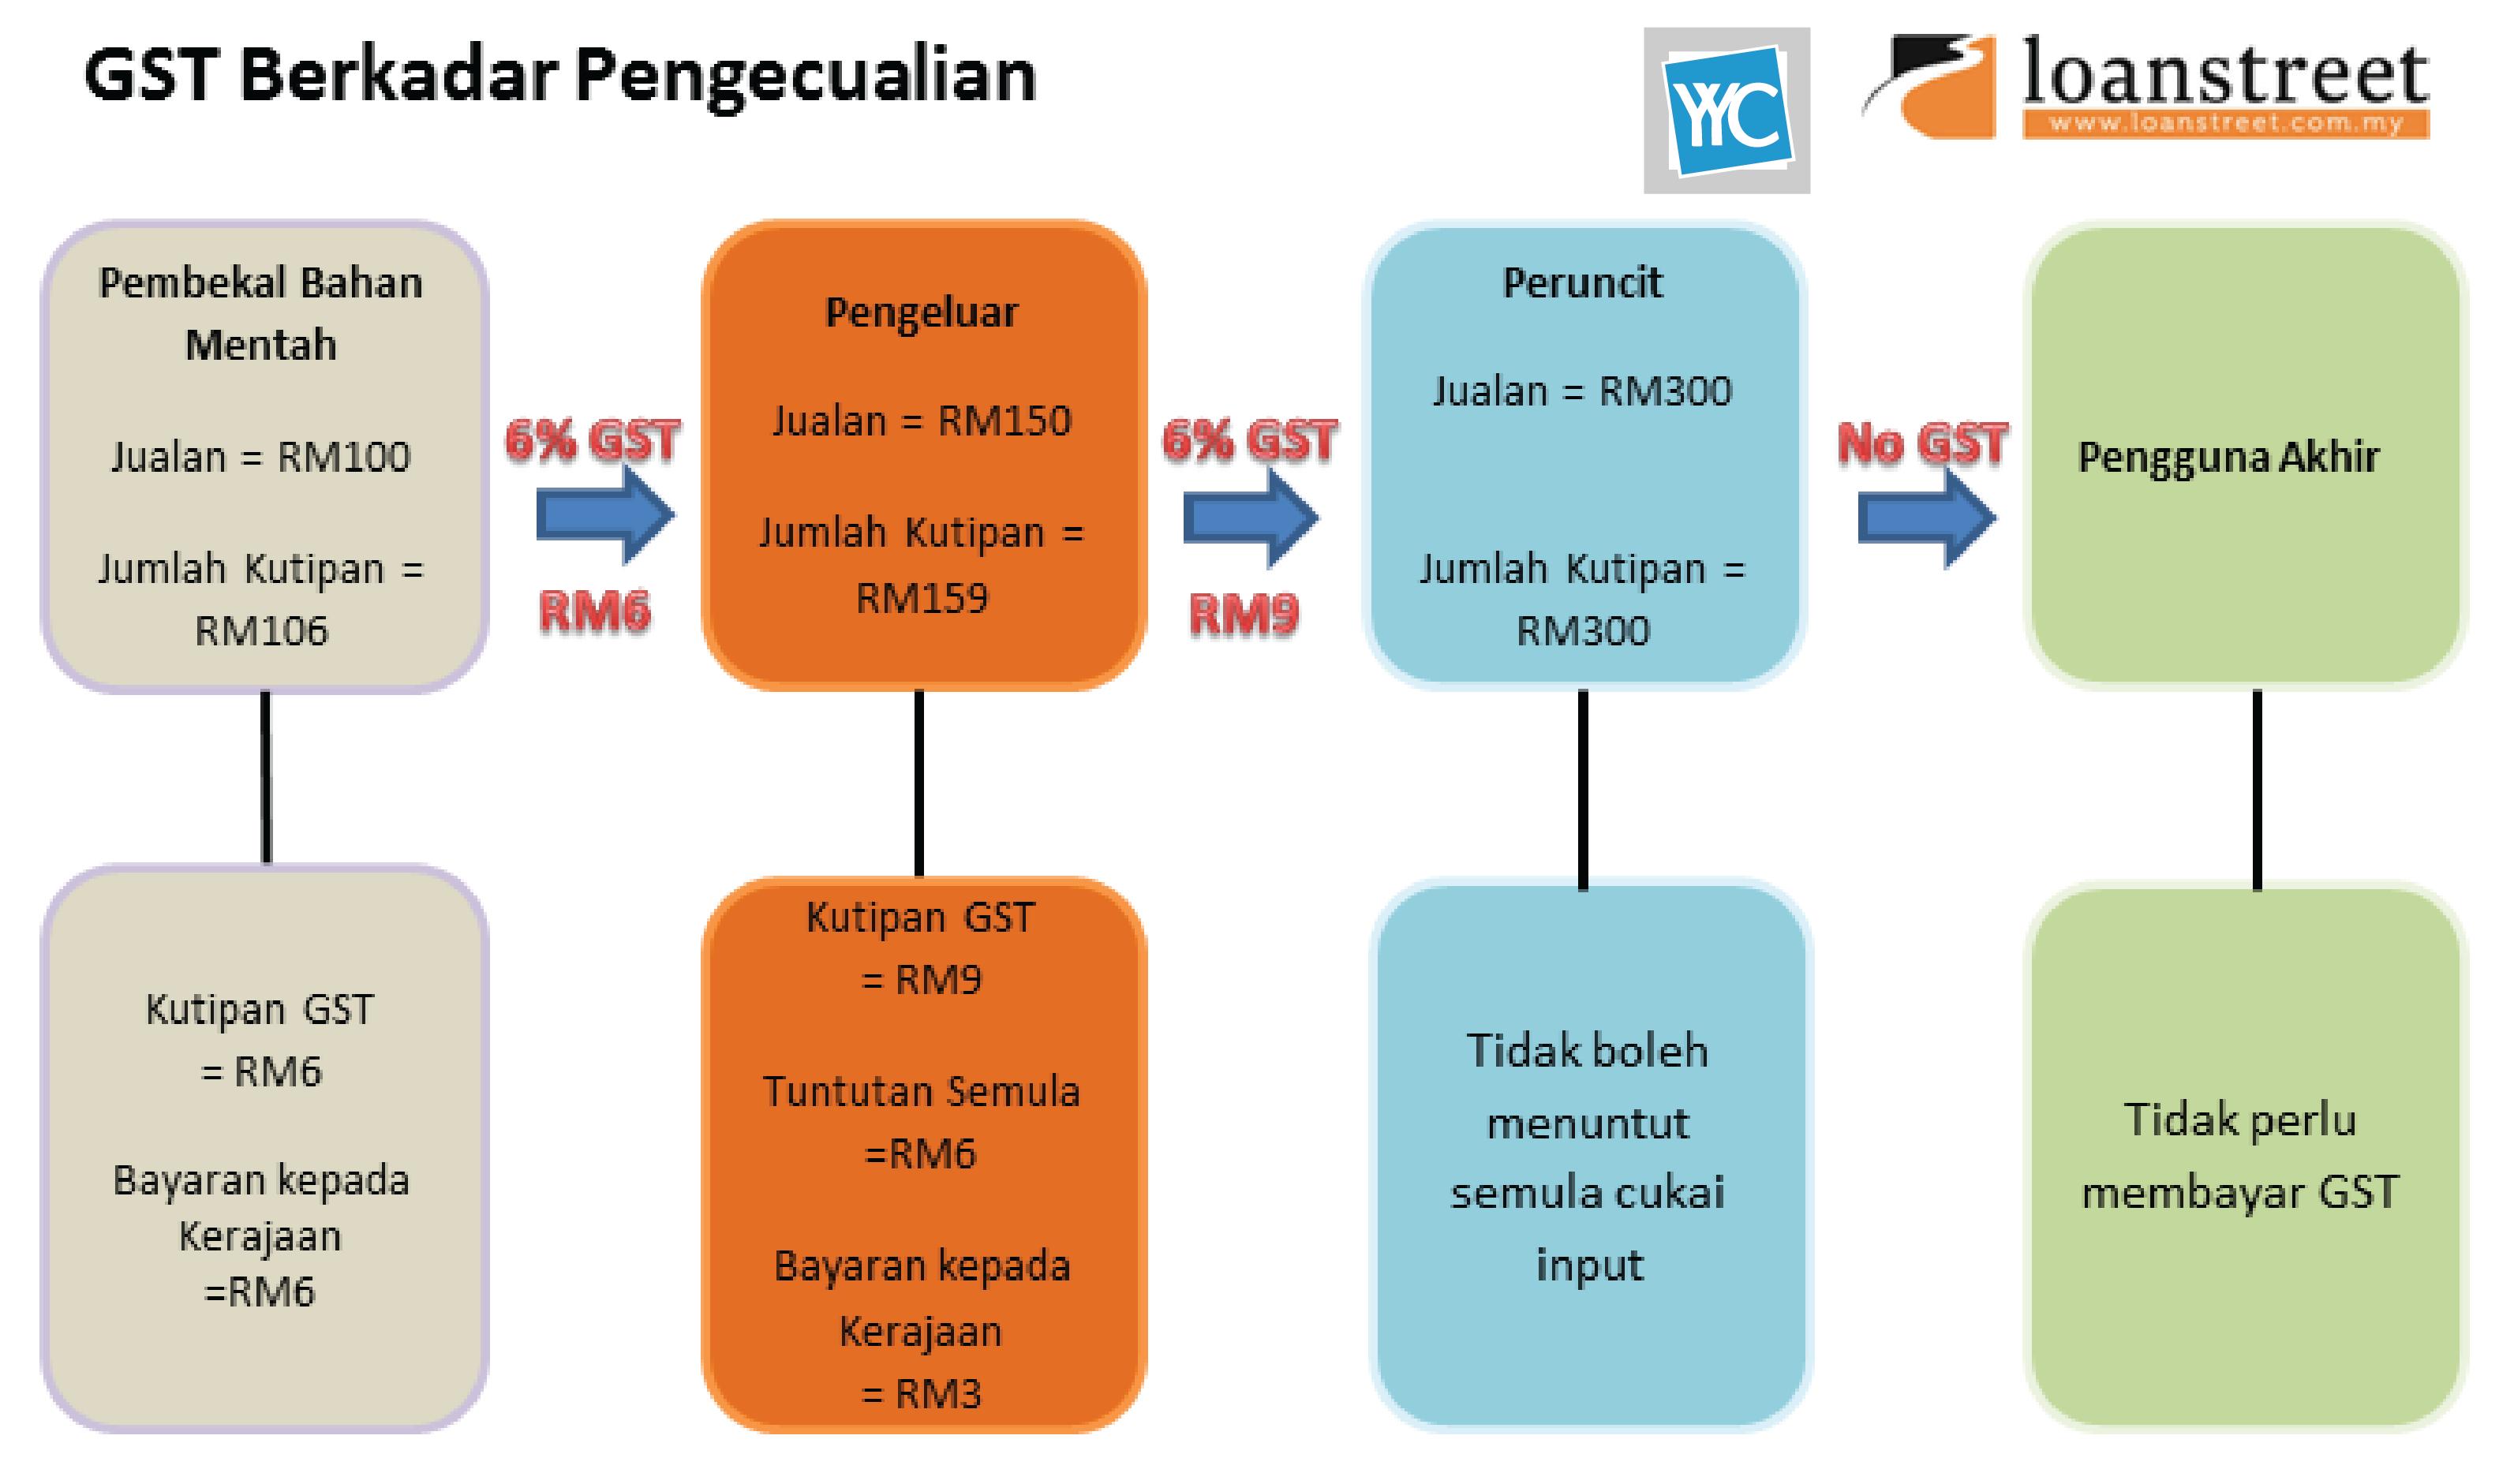 Penjelasan GST Di Malaysia | Loanstreet